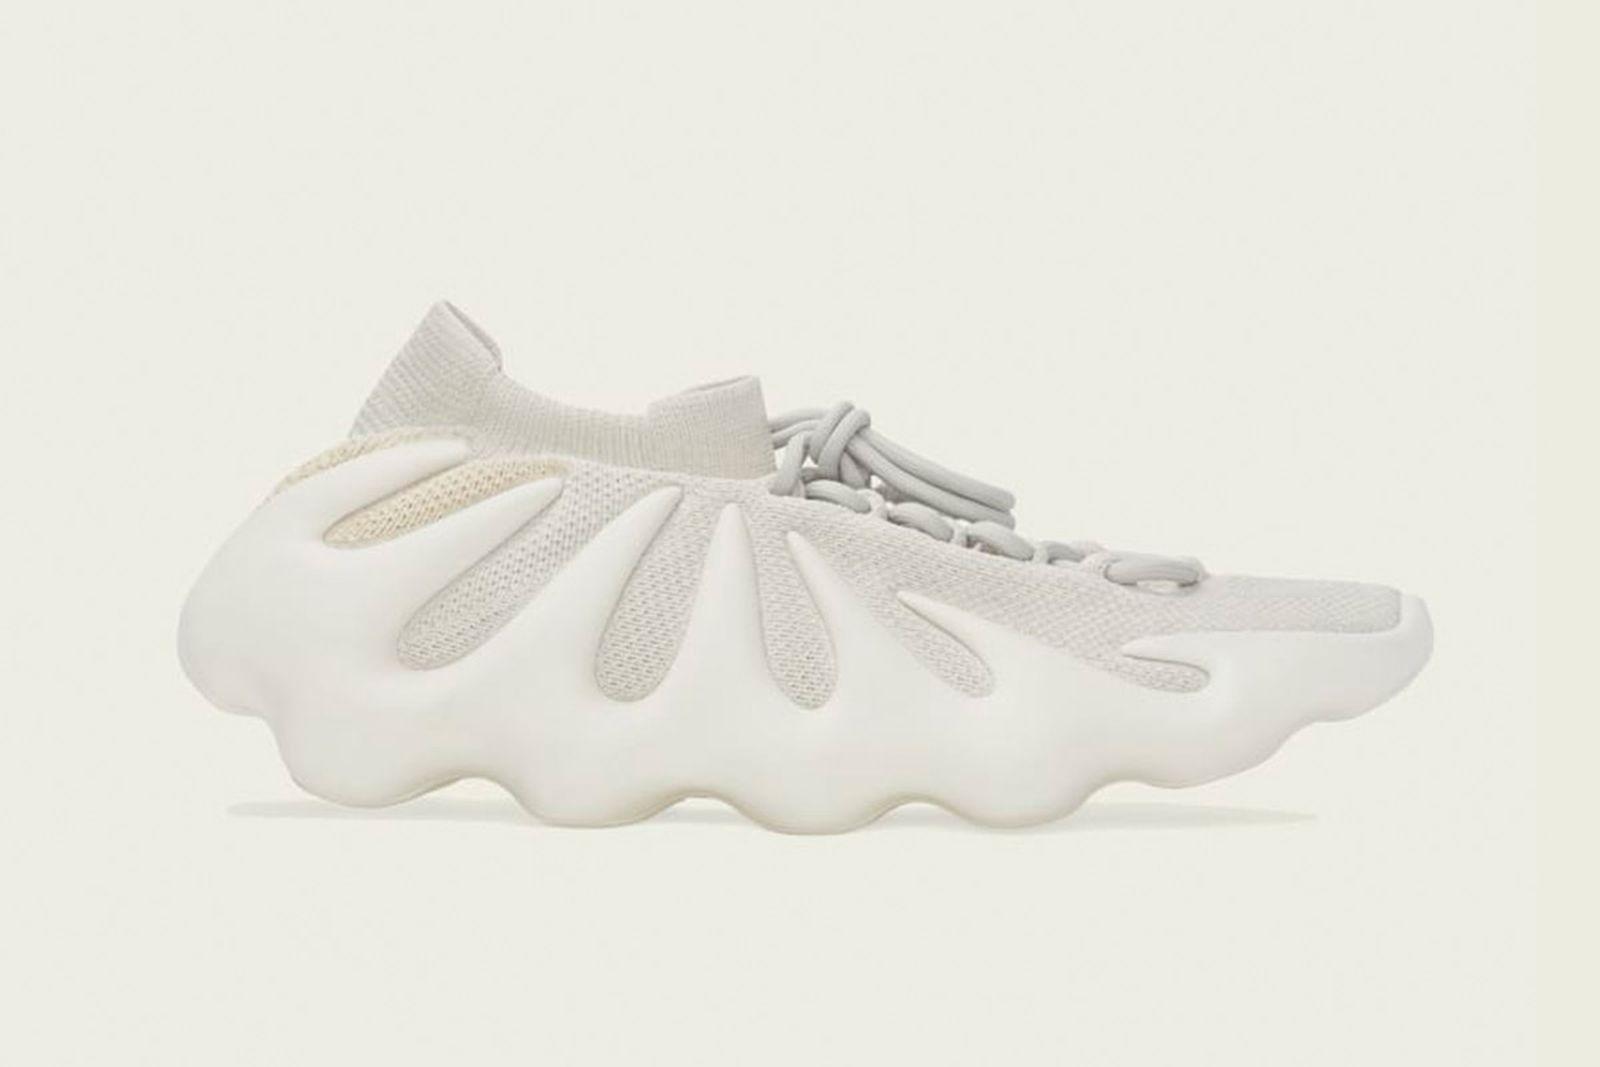 adidas-yeezy-september-release-info-date-price-01